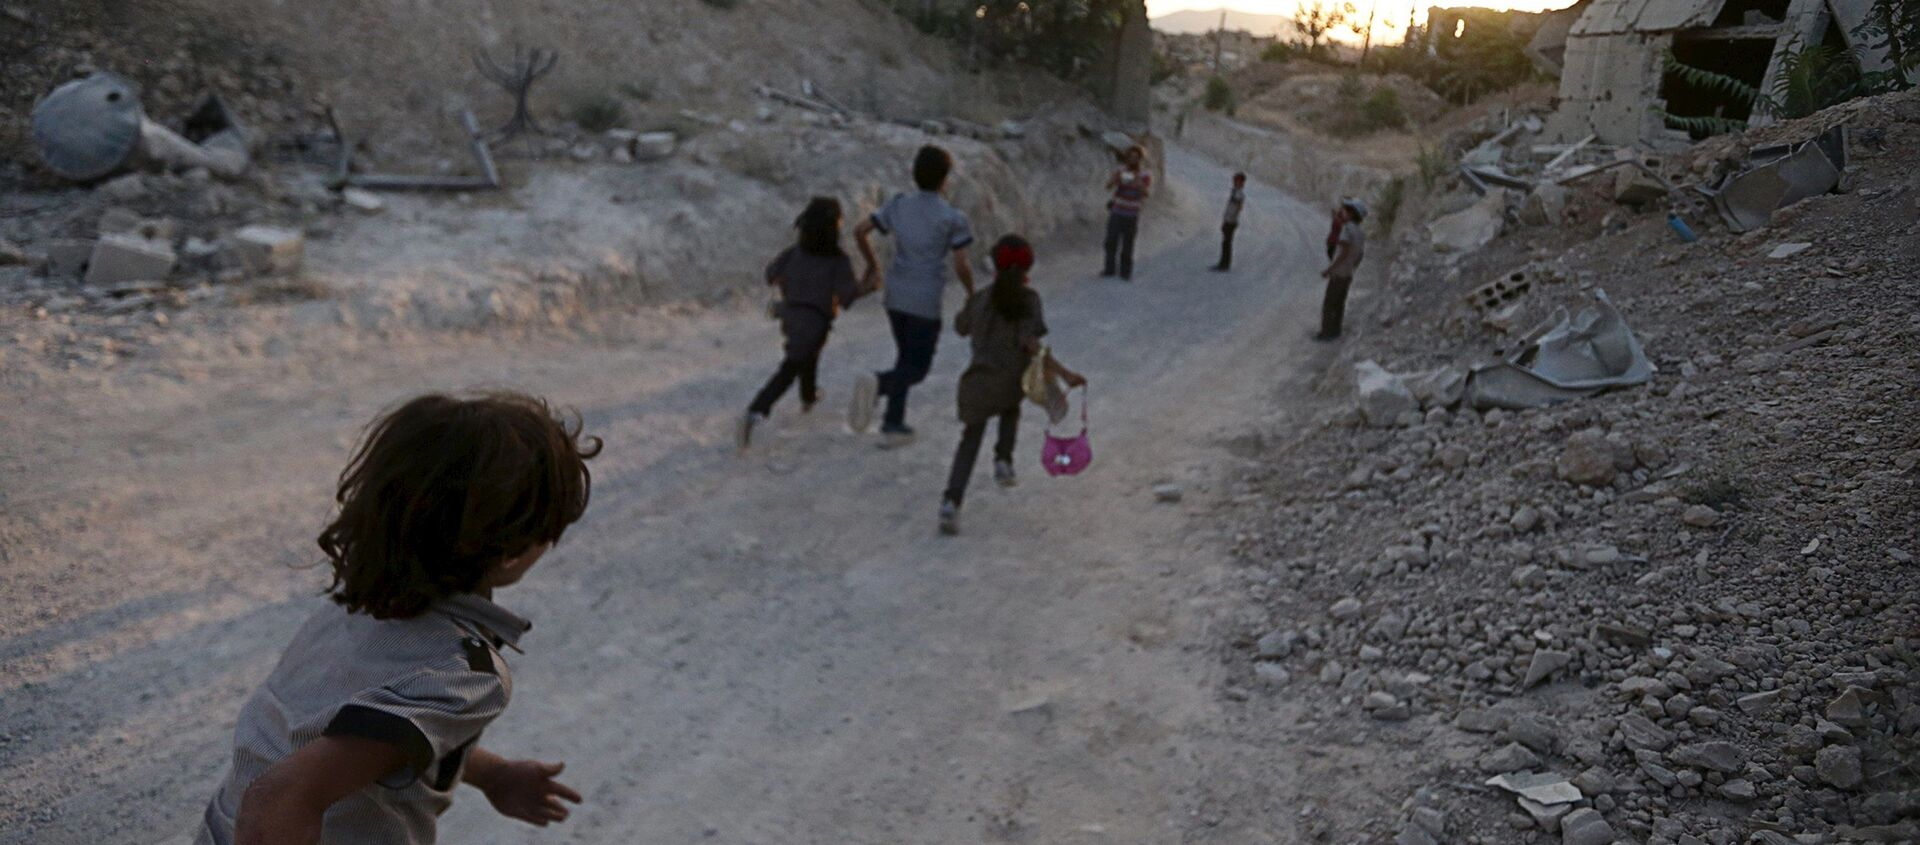 I bambini in una città occupata dai combattenti vicino a Damasco - Sputnik Italia, 1920, 17.06.2018